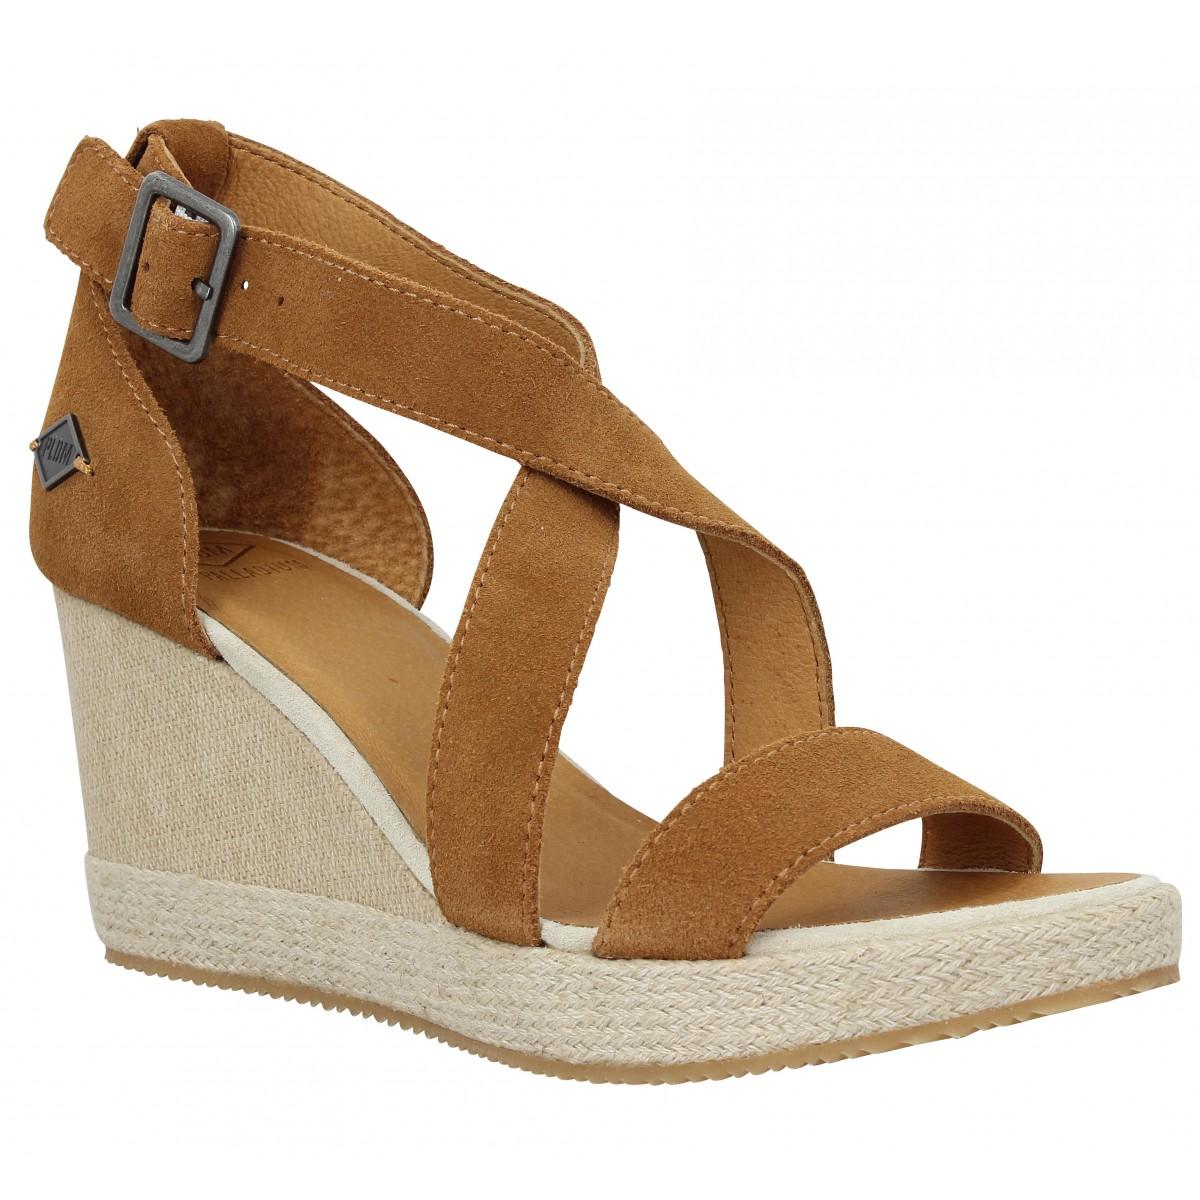 Sandales talons PLDM by PALLADIUM Wellton SUD velours Femme Ocra